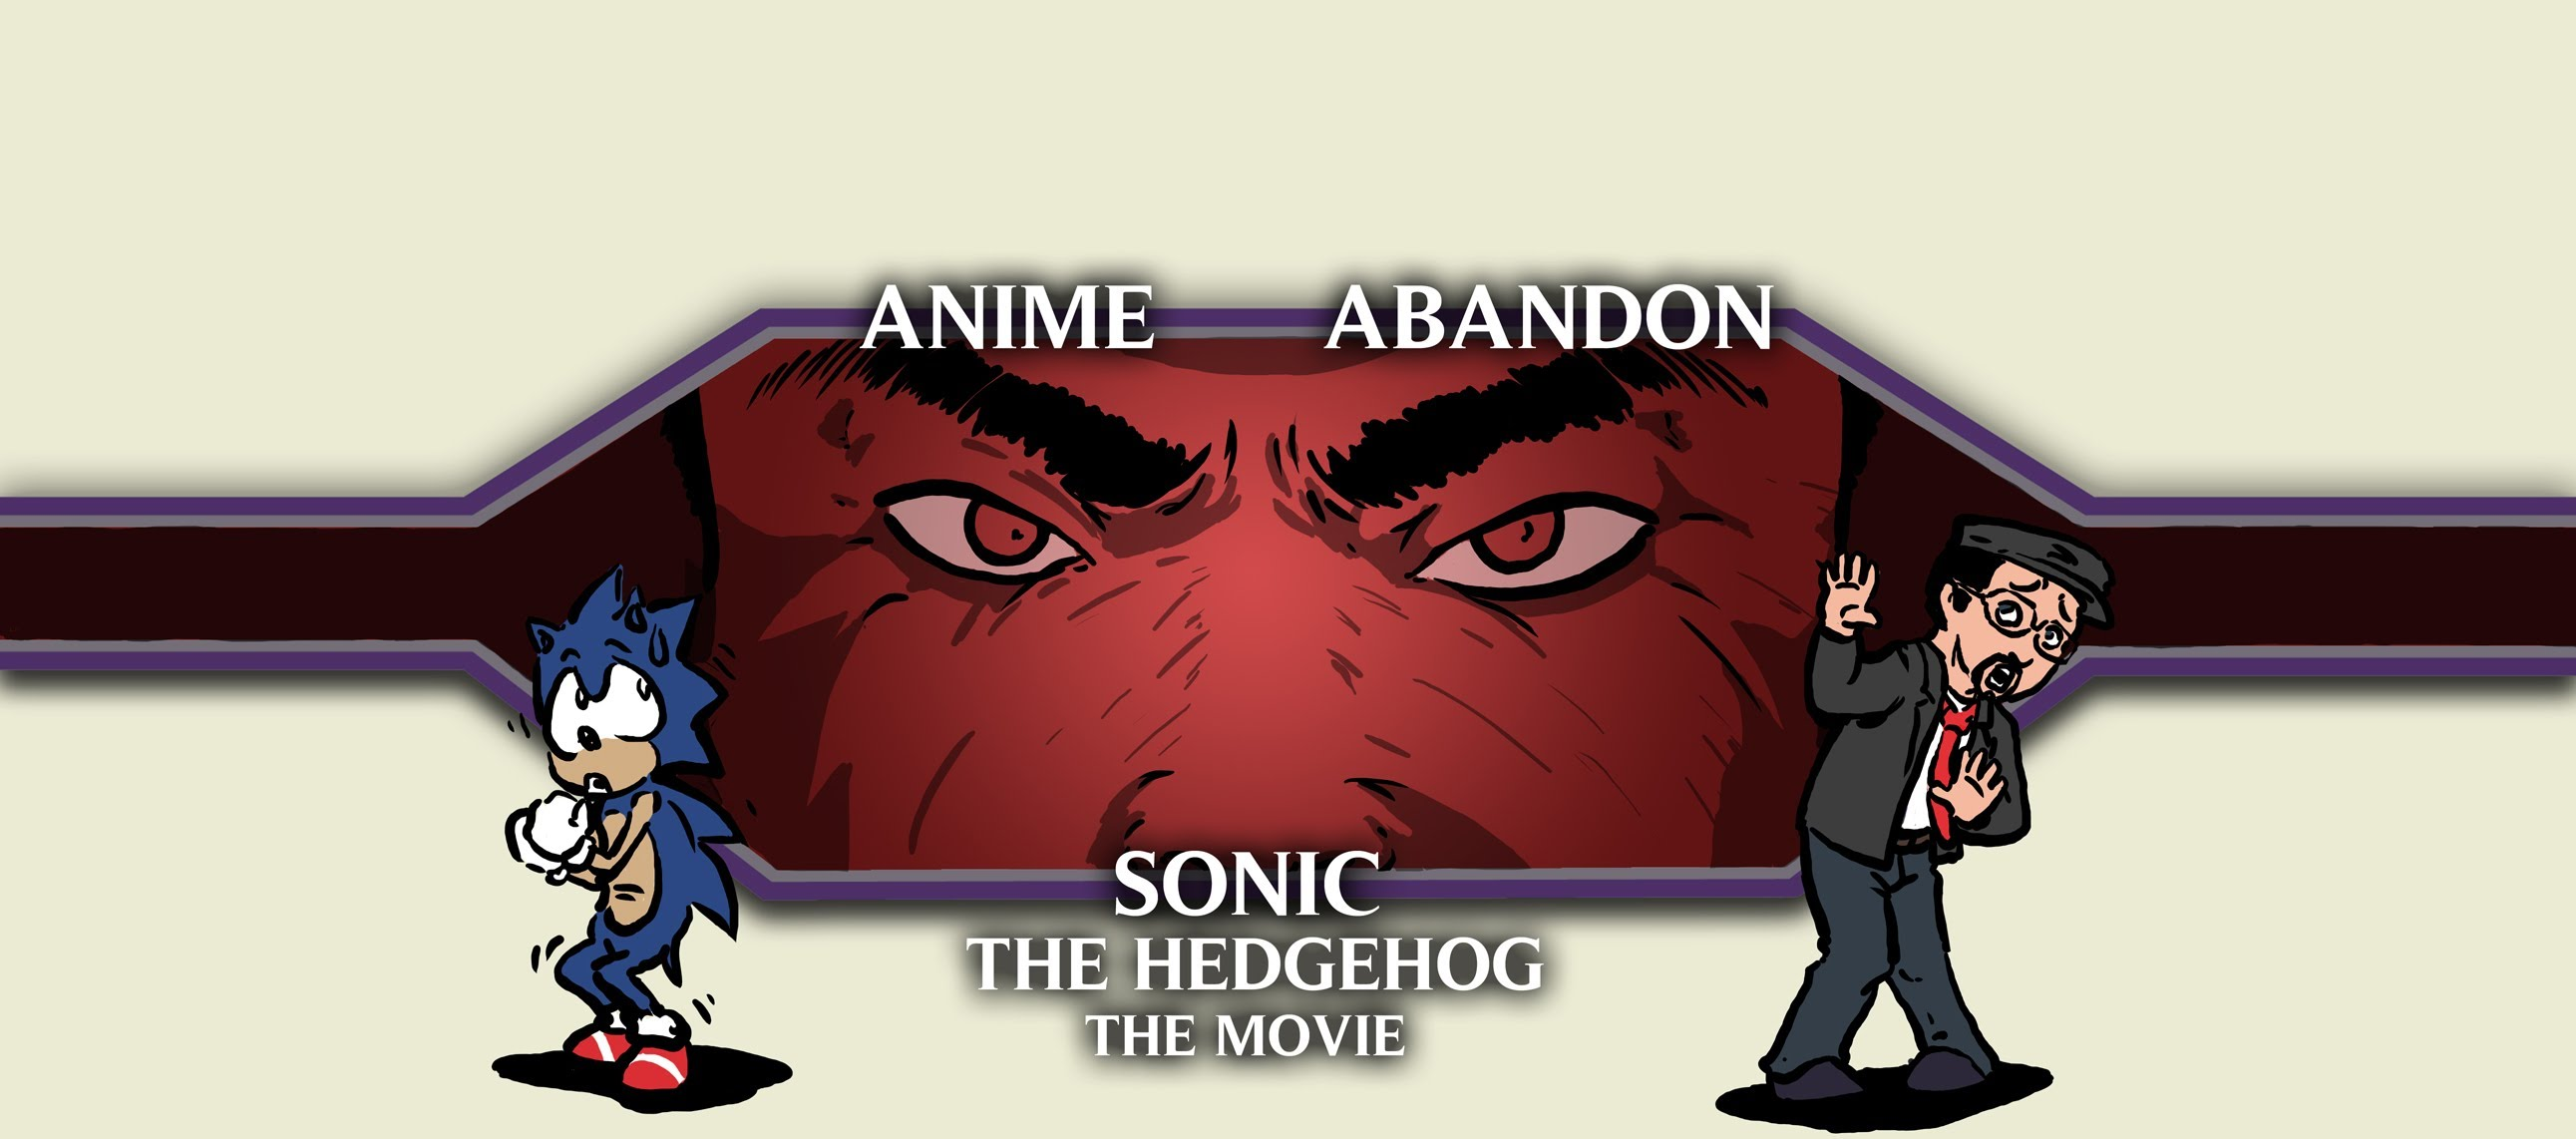 Anime Abandon Sonic The Hedgehog The Movie Tv Episode 2012 Imdb